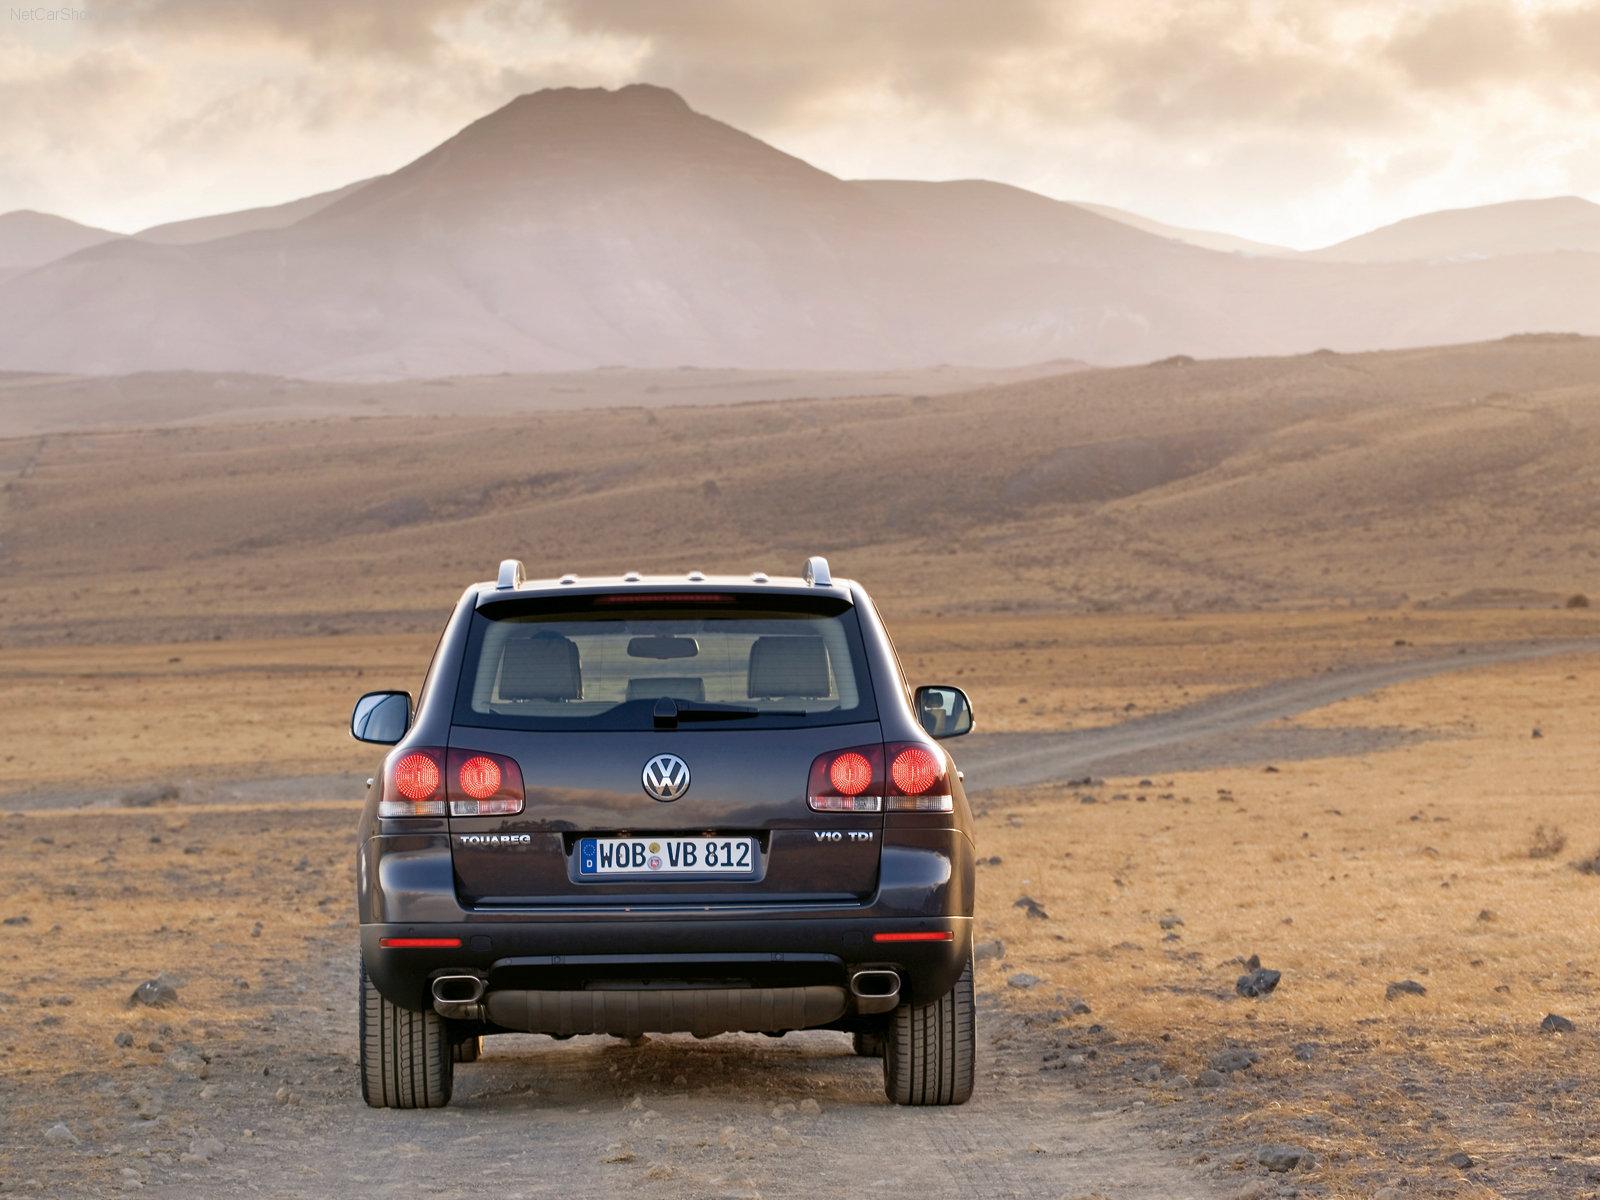 https://w04.ru/foto/Volkswagen-Touareg_2007_1600x1200_wallpaper_1e.jpg